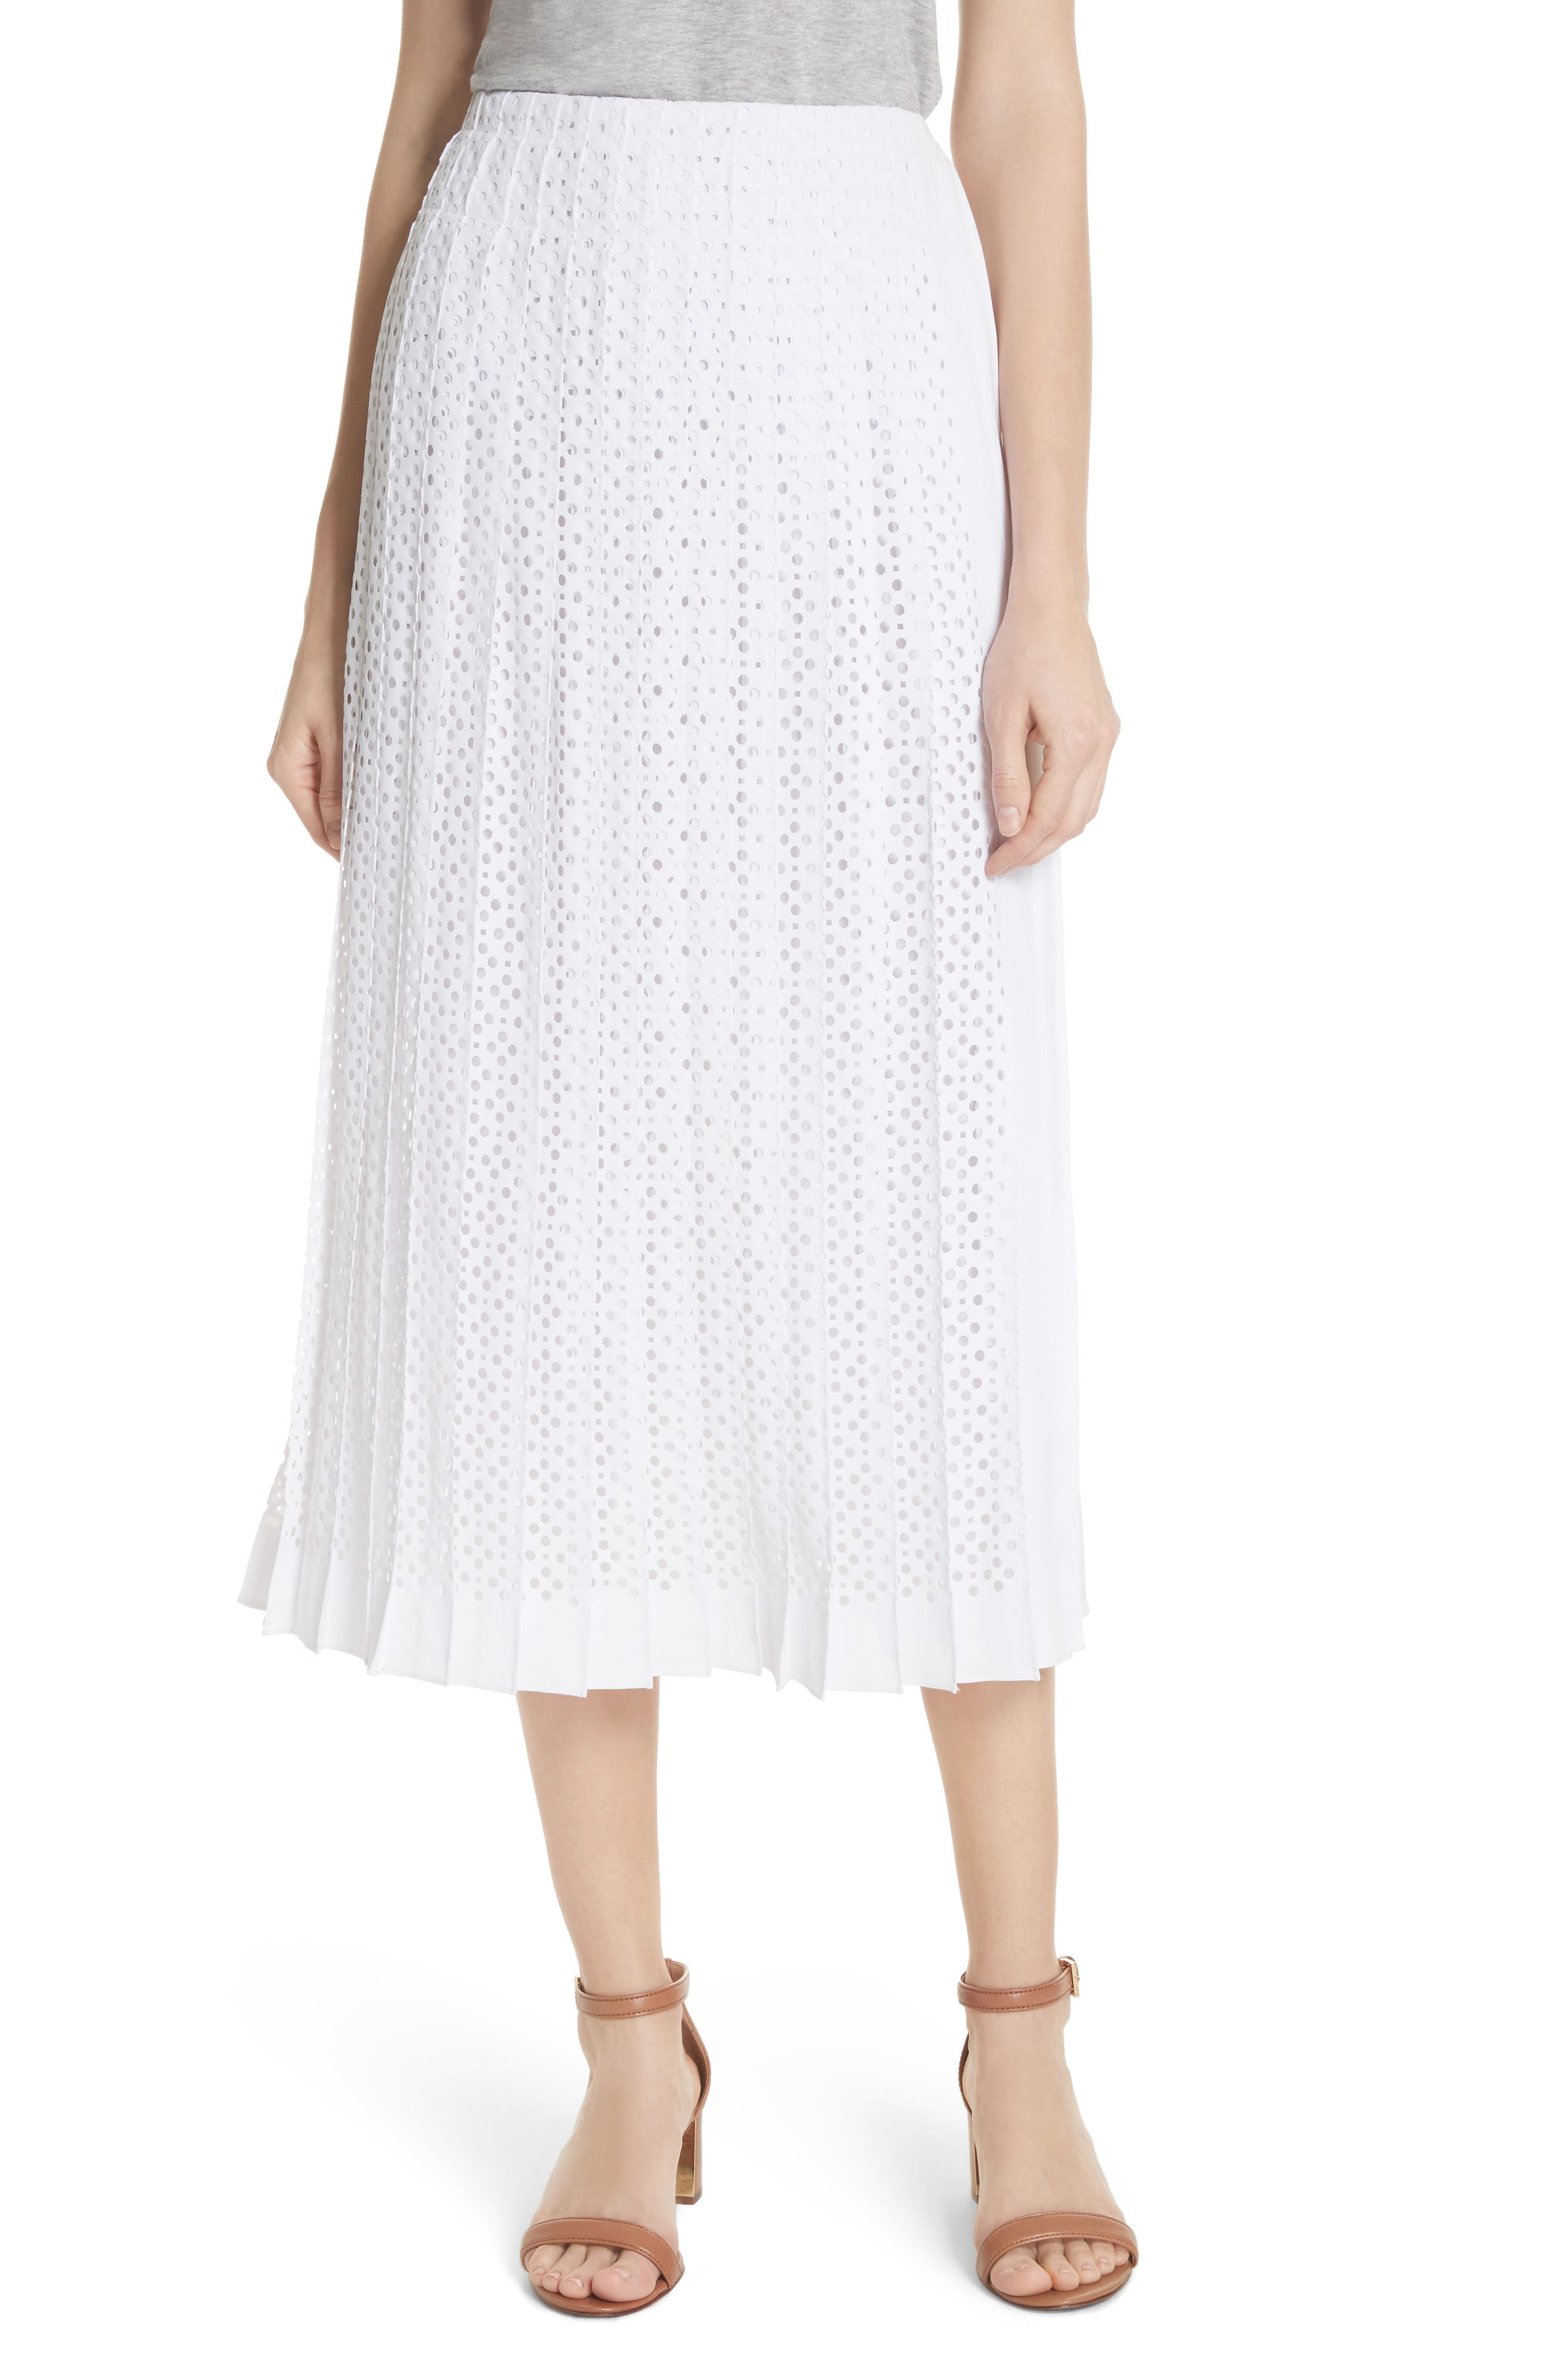 TORY BURCH,                             Carine Eyelet Midi Skirt,                             Main thumbnail 1, color,                             100